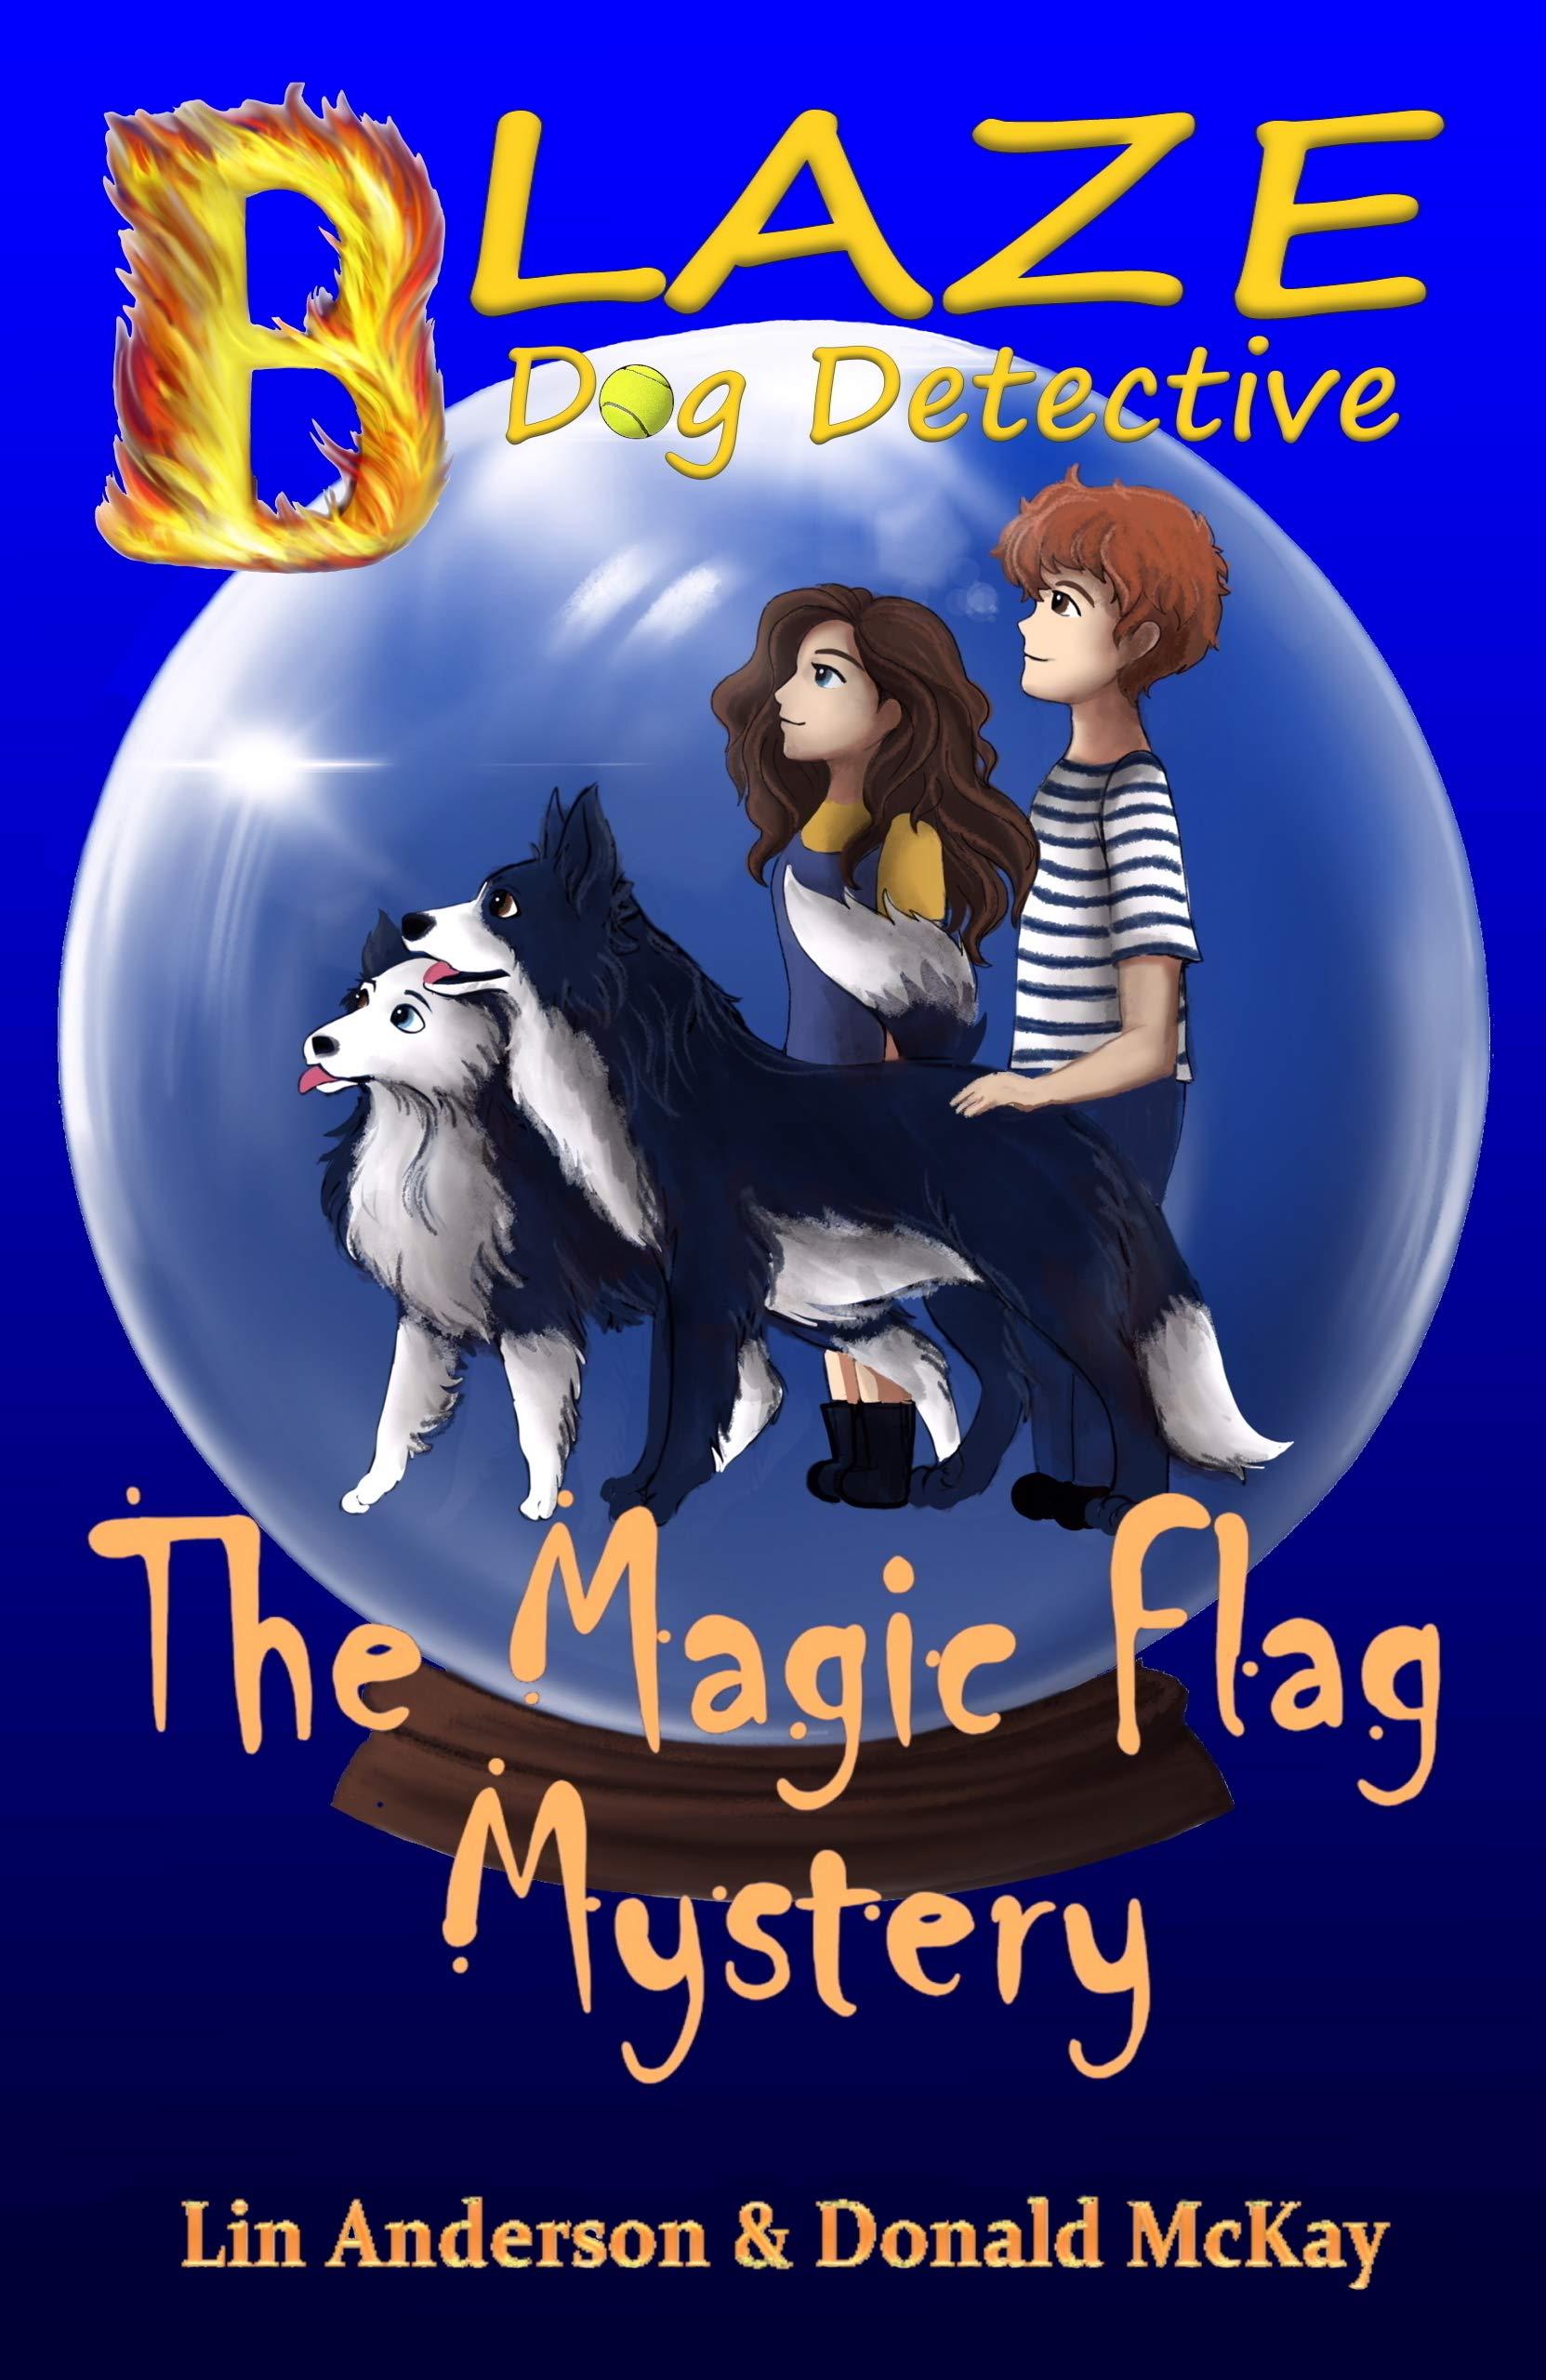 The Magic Flag Mystery (Blaze Dog Detective Book 1)